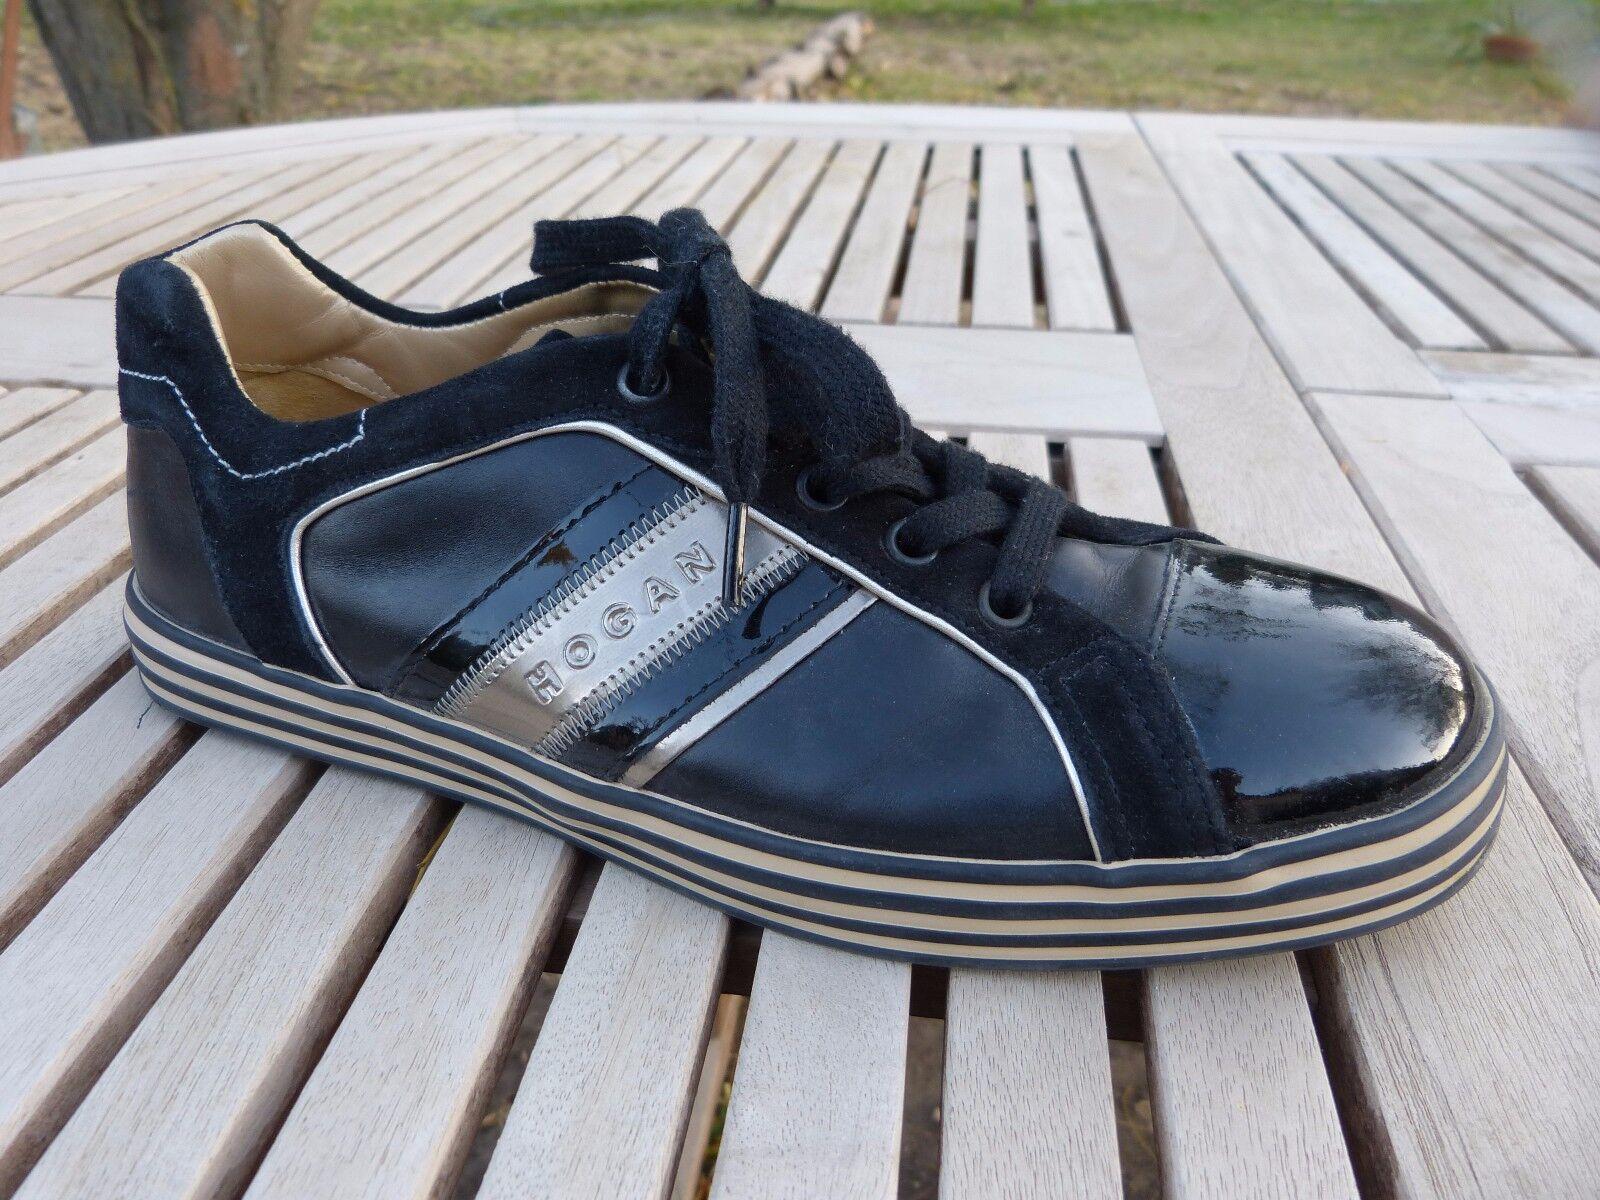 Fff zapatillas TENNIS marque HOGAN negro T F 39 EN EXCELLENT ETAT